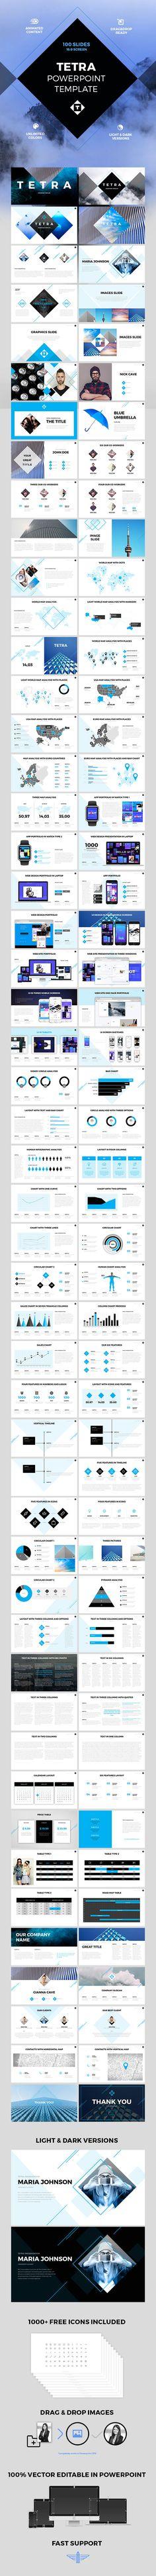 Tetra #UI Presentation #app mockup • Download ➝ https://graphicriver.net/item/tetra-ppt-template/19465575?ref=pxcr